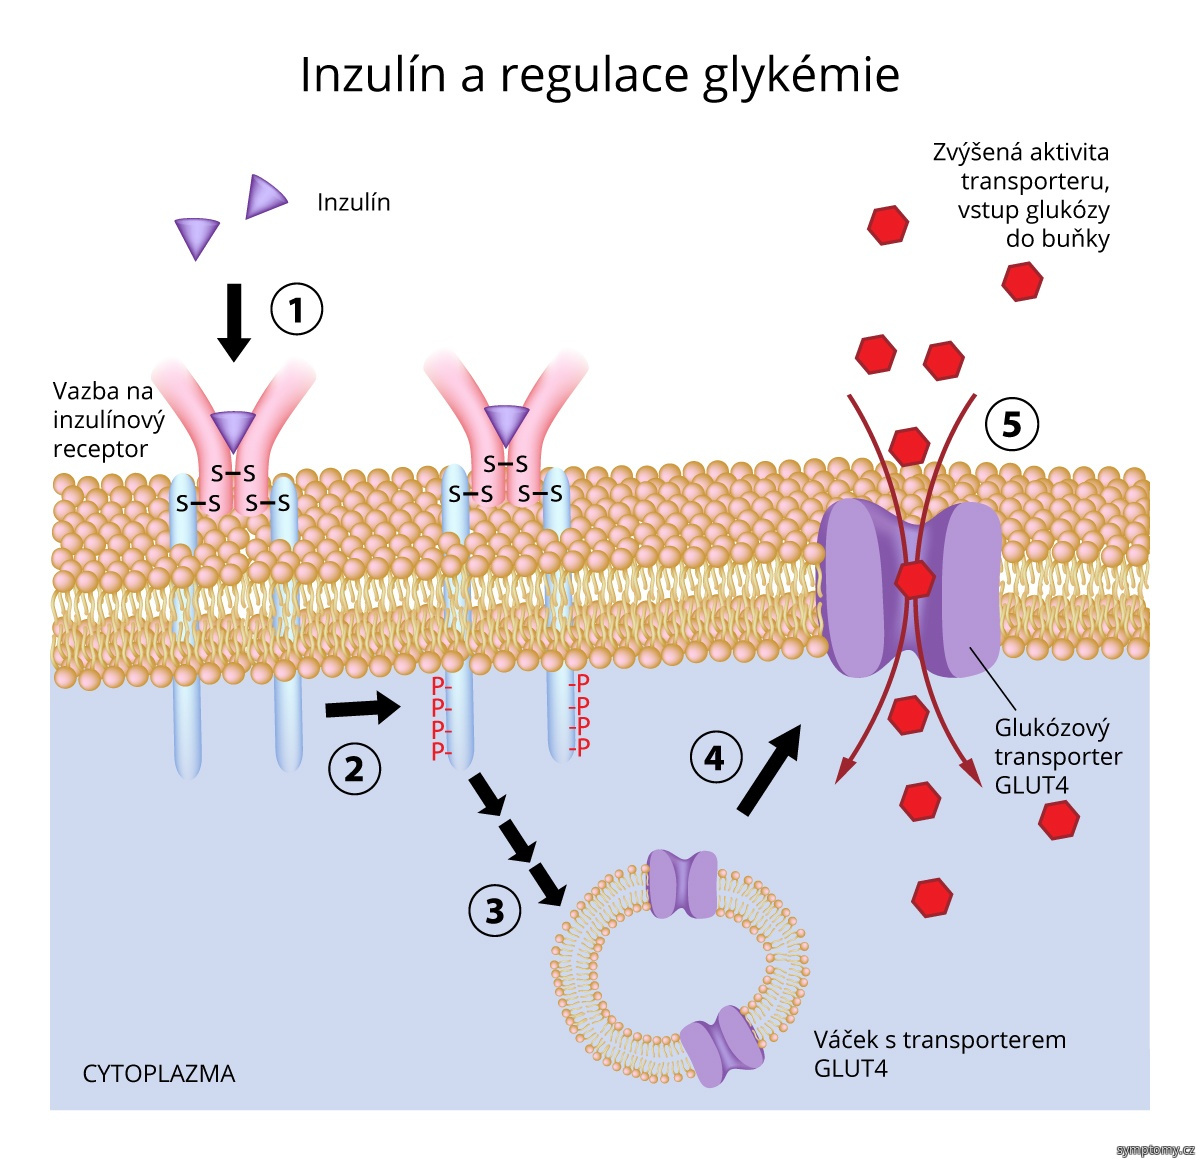 Inzulín a regulace glykémie